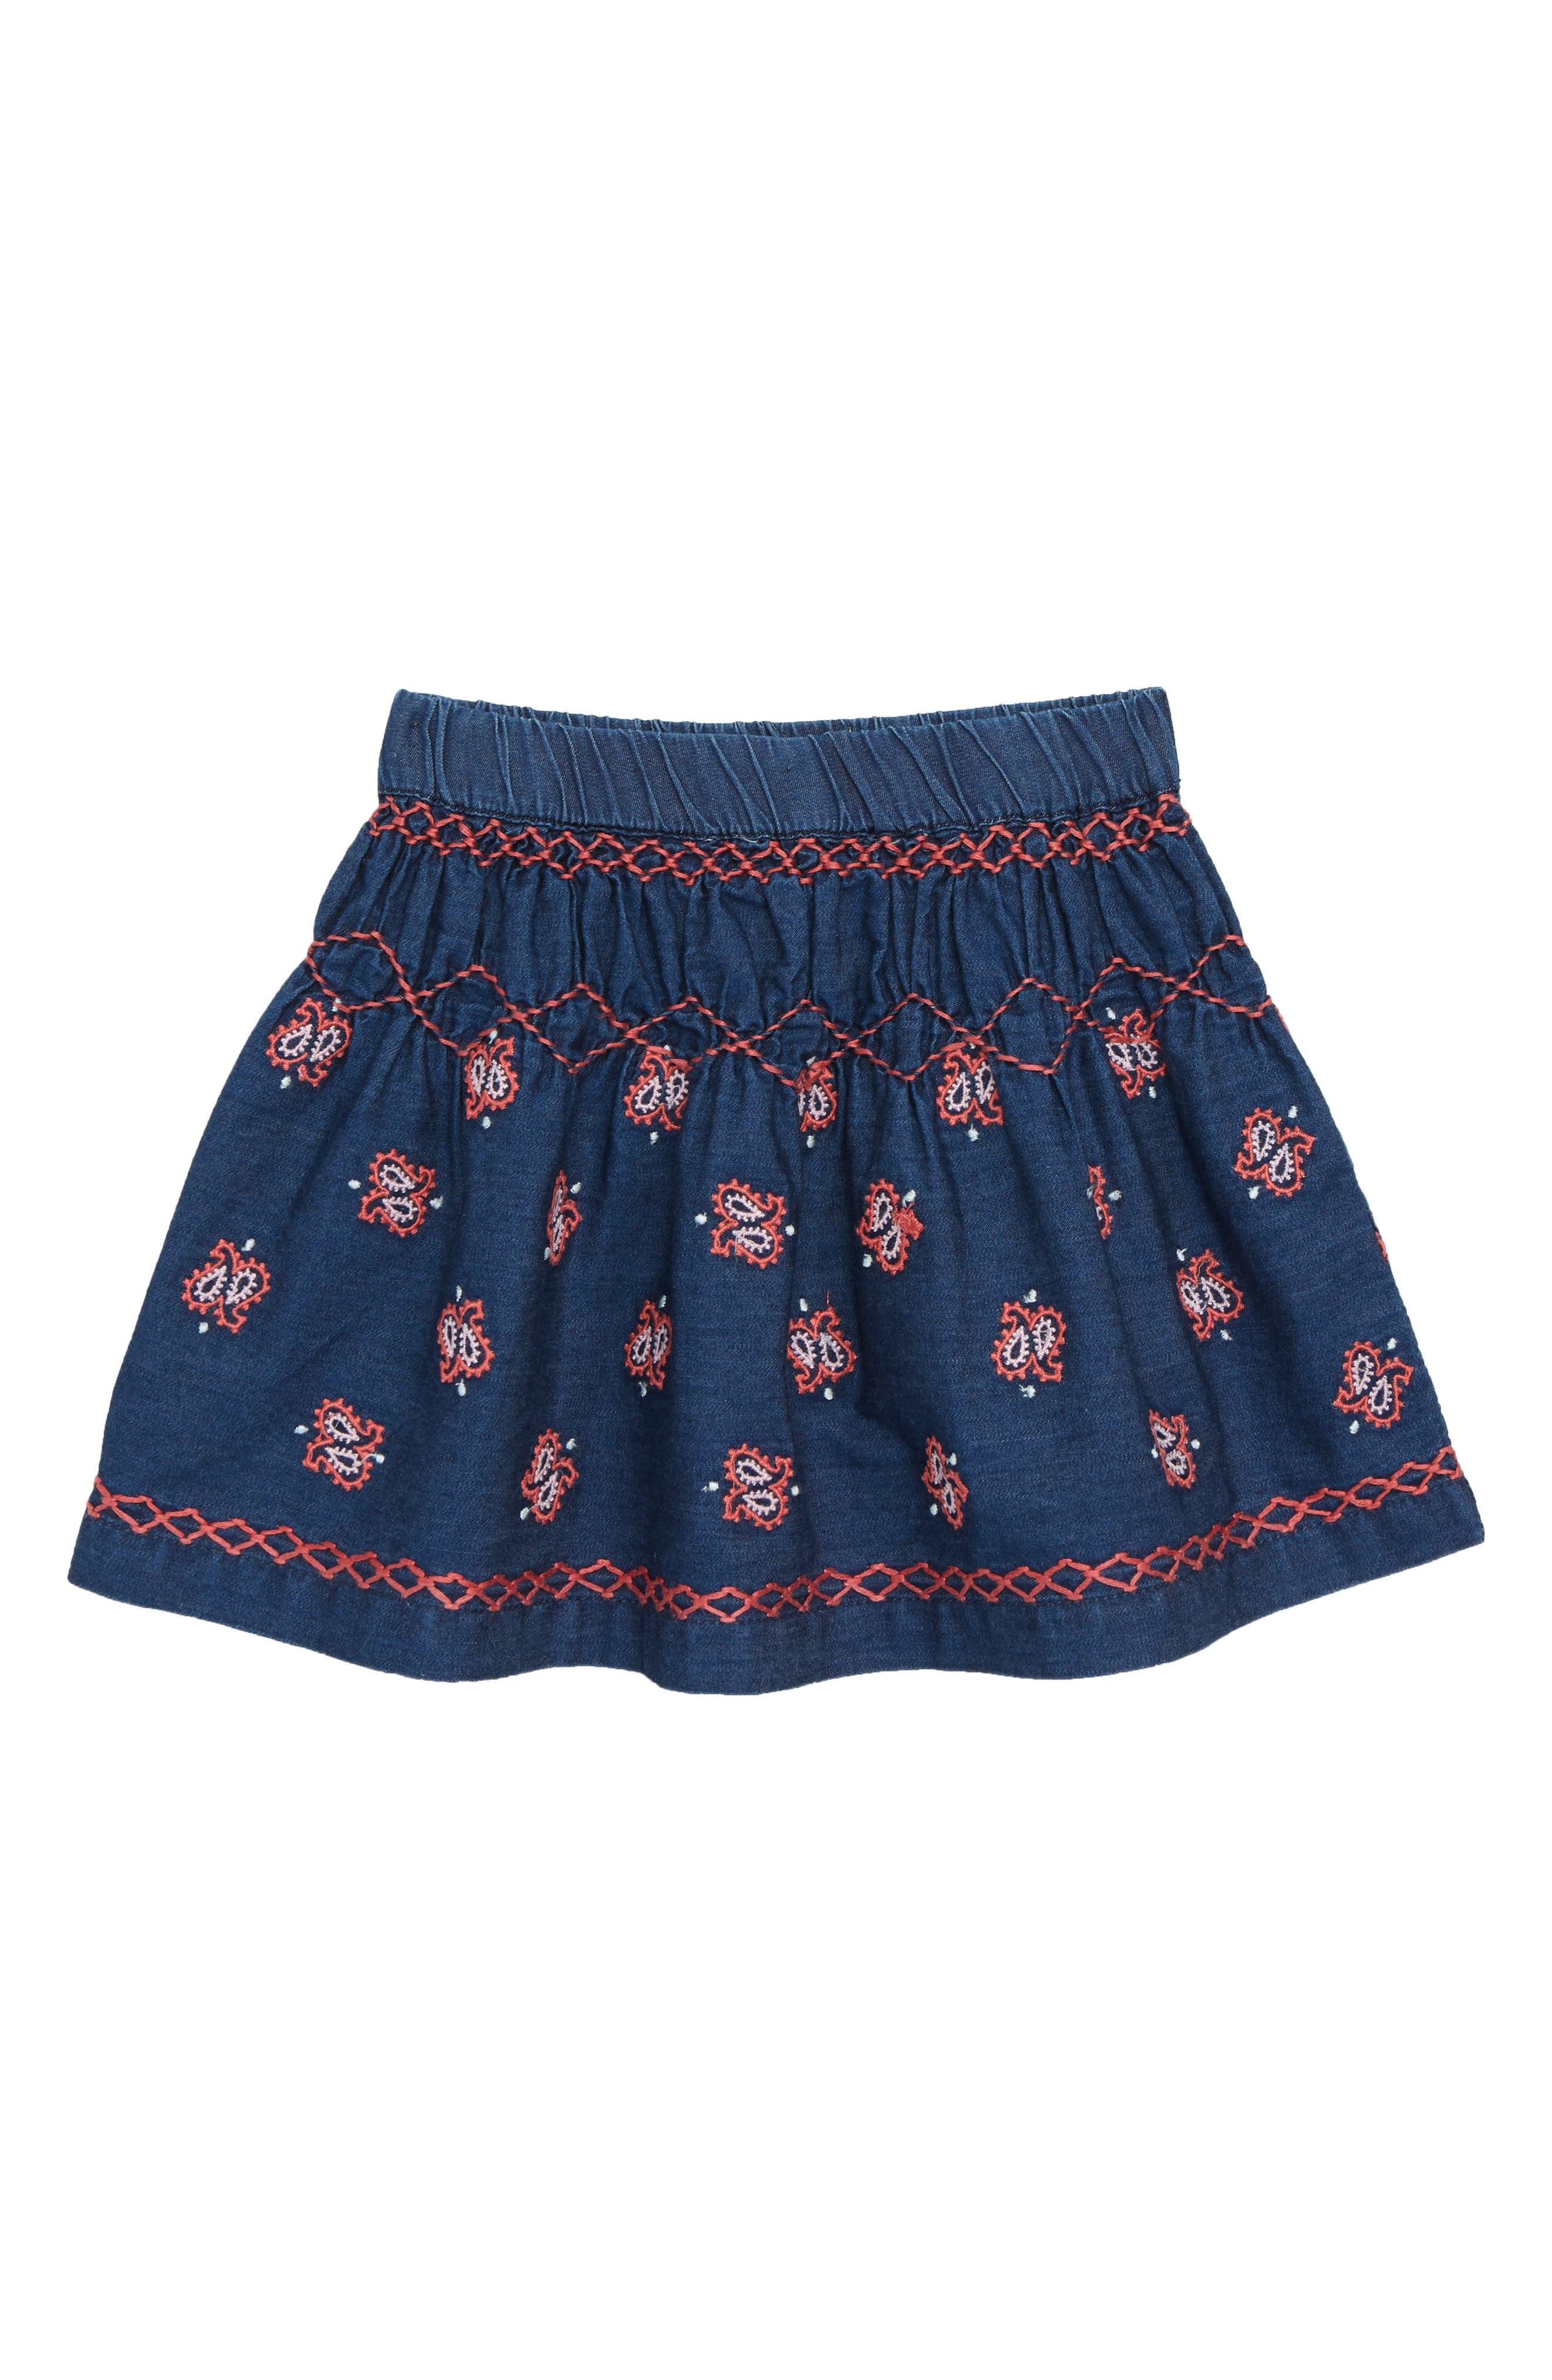 Grace Embroidered Denim Skirt,                             Main thumbnail 1, color,                             Indigo